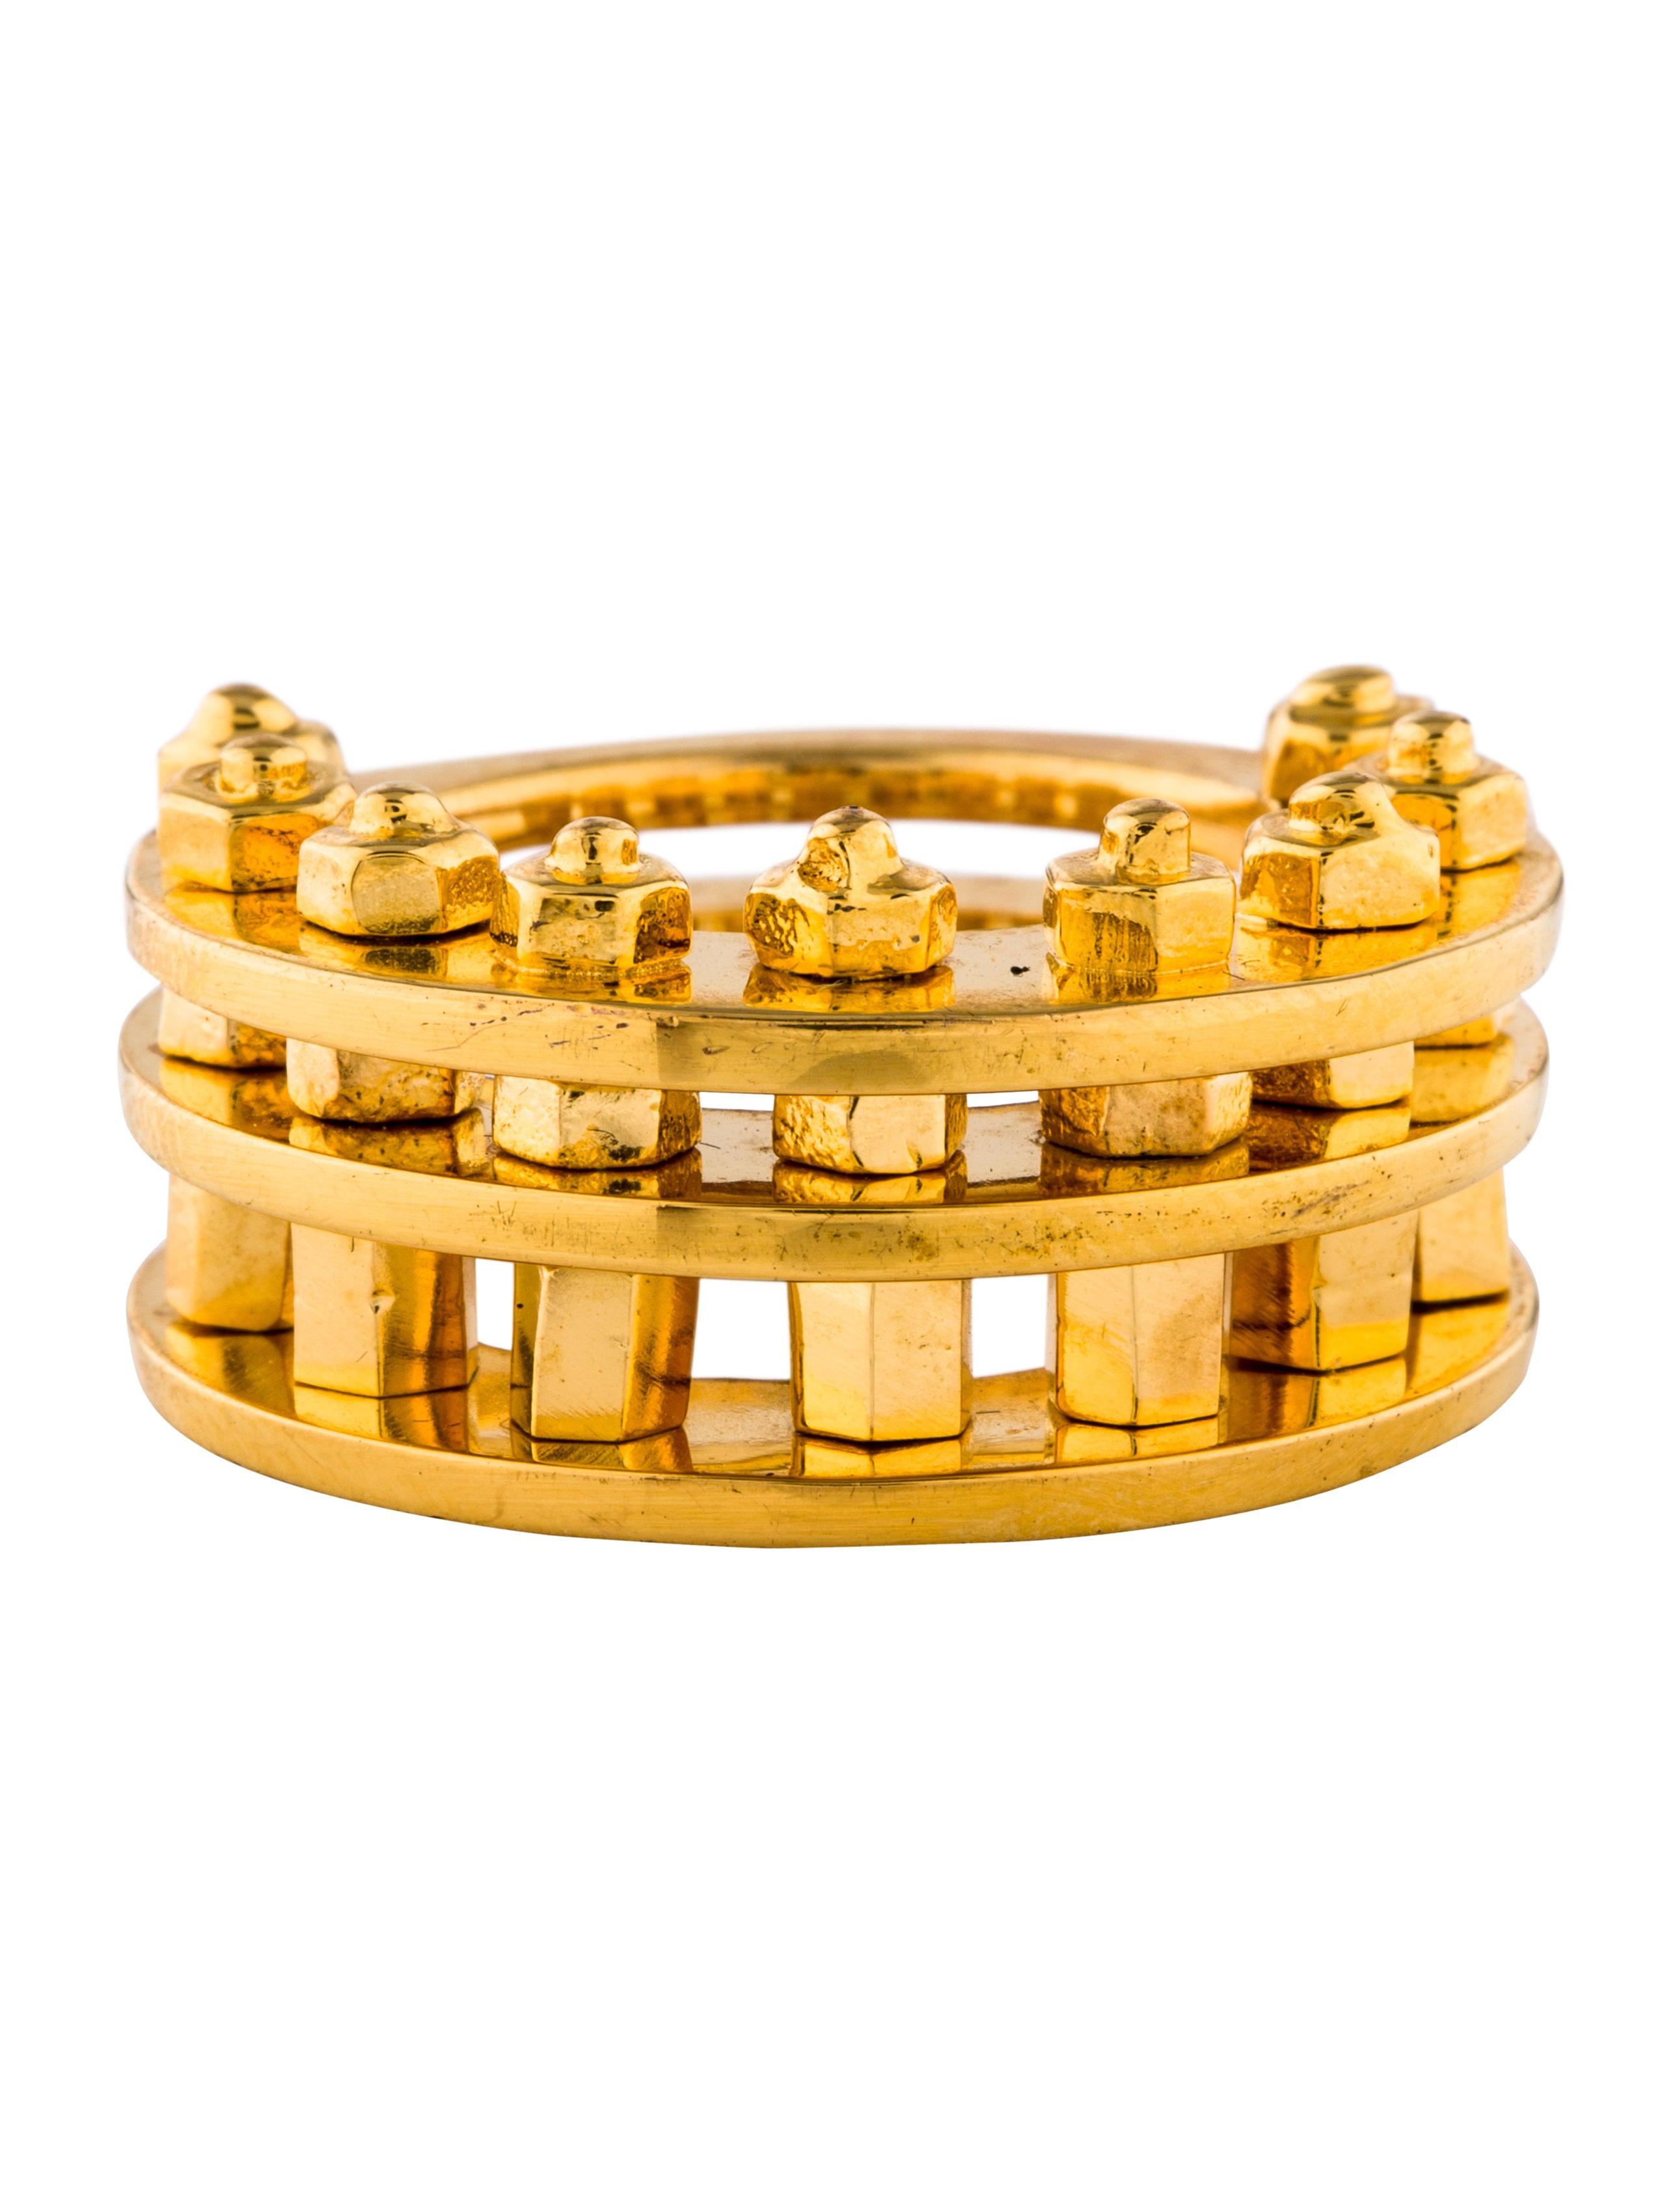 Eddie Borgo Nuts Bolts Ring Rings Ebo22884 The Realreal